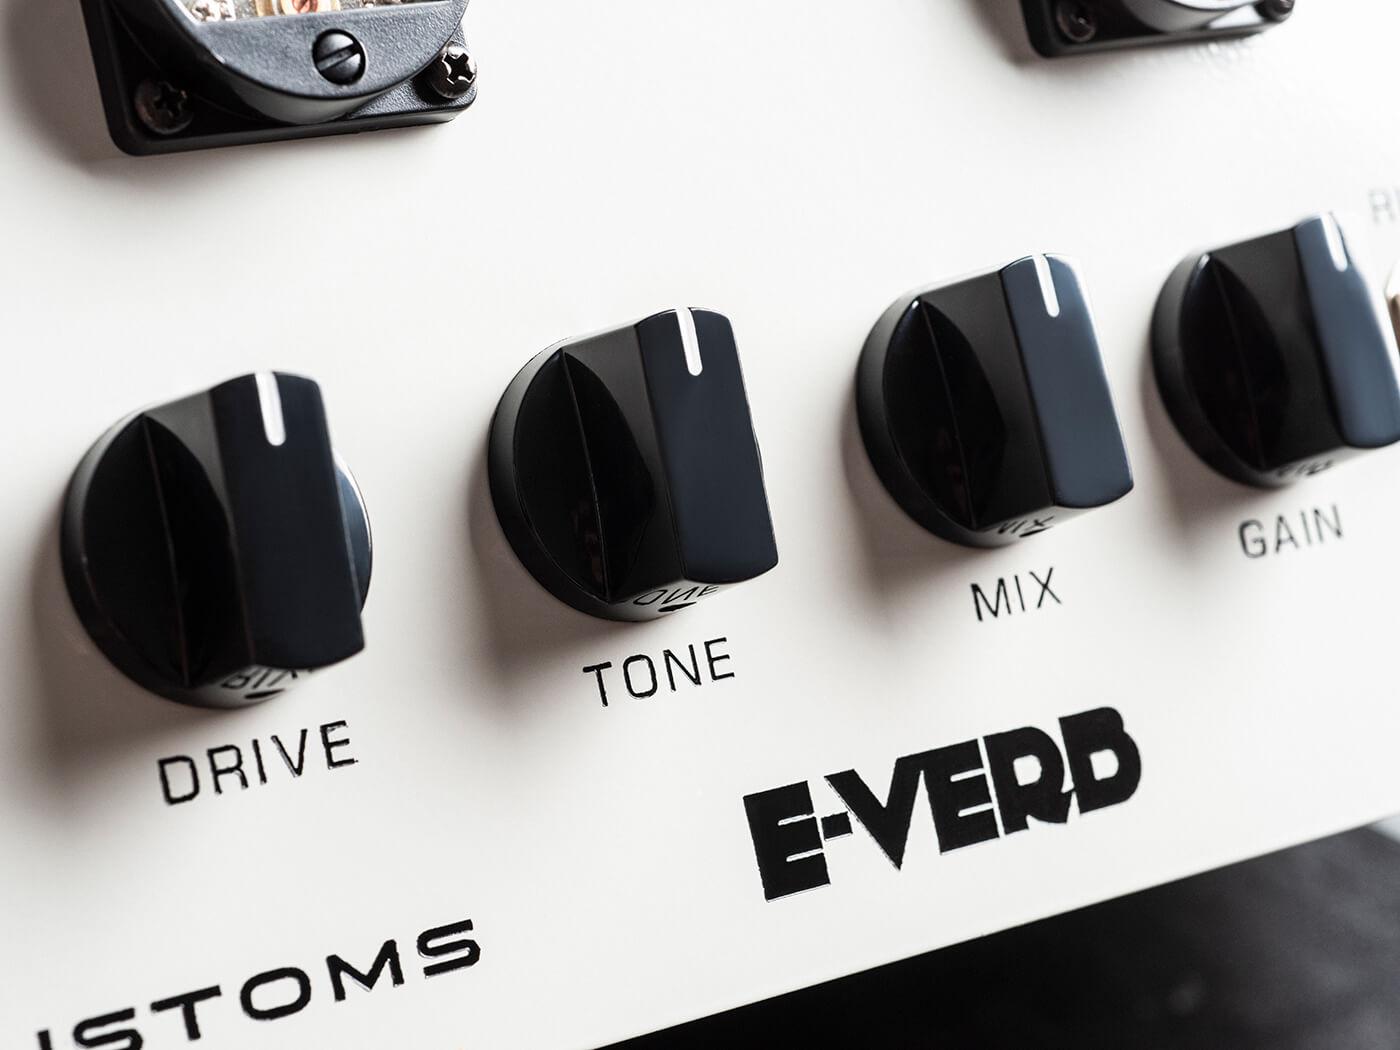 Ebo Customs E-verb Studio